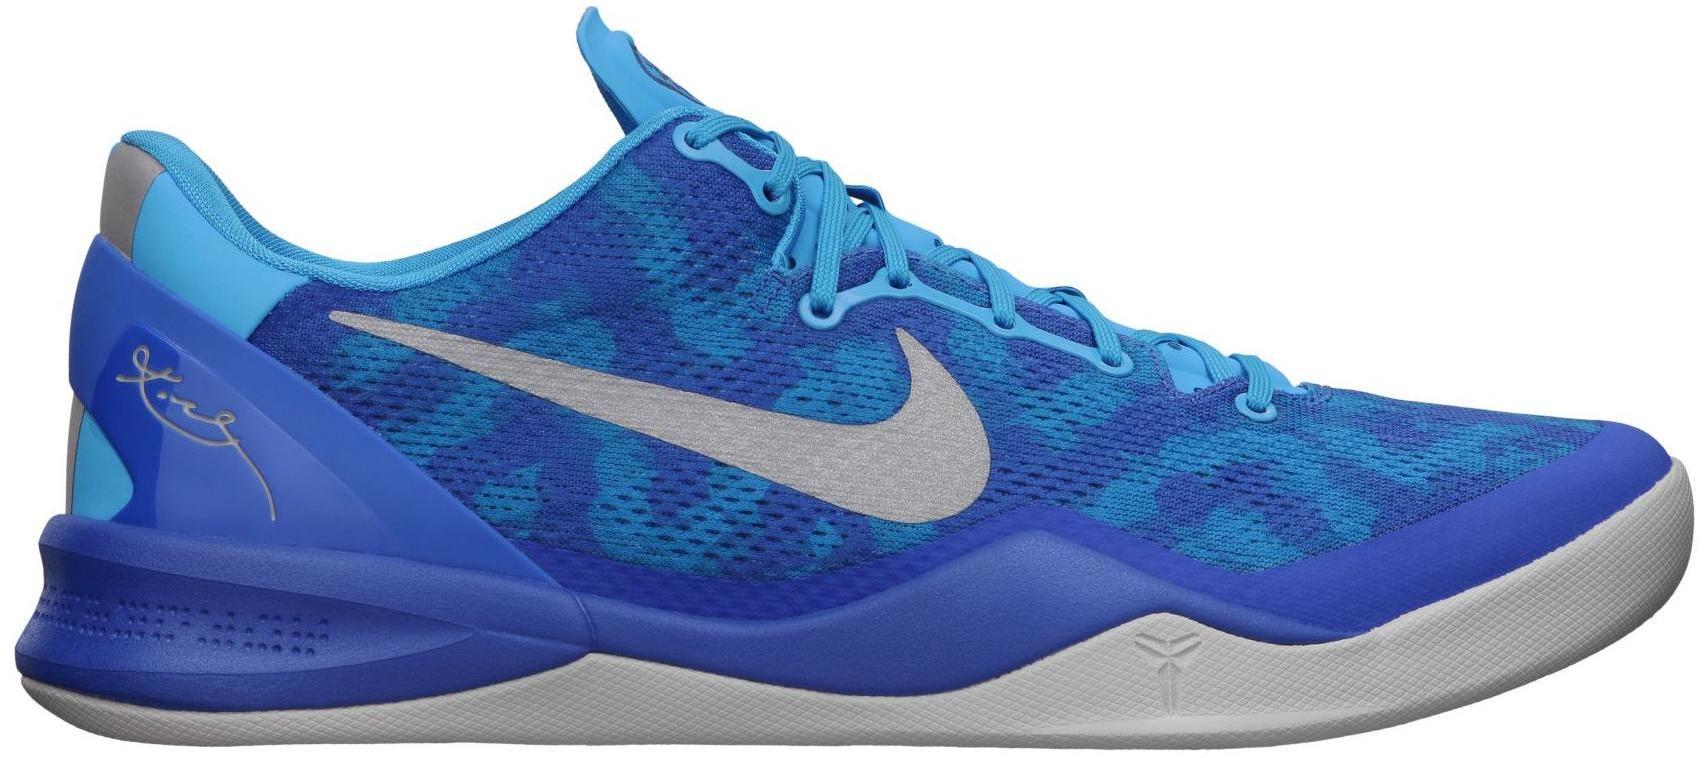 Nike Kobe 8 Blue Glow - 555035-400